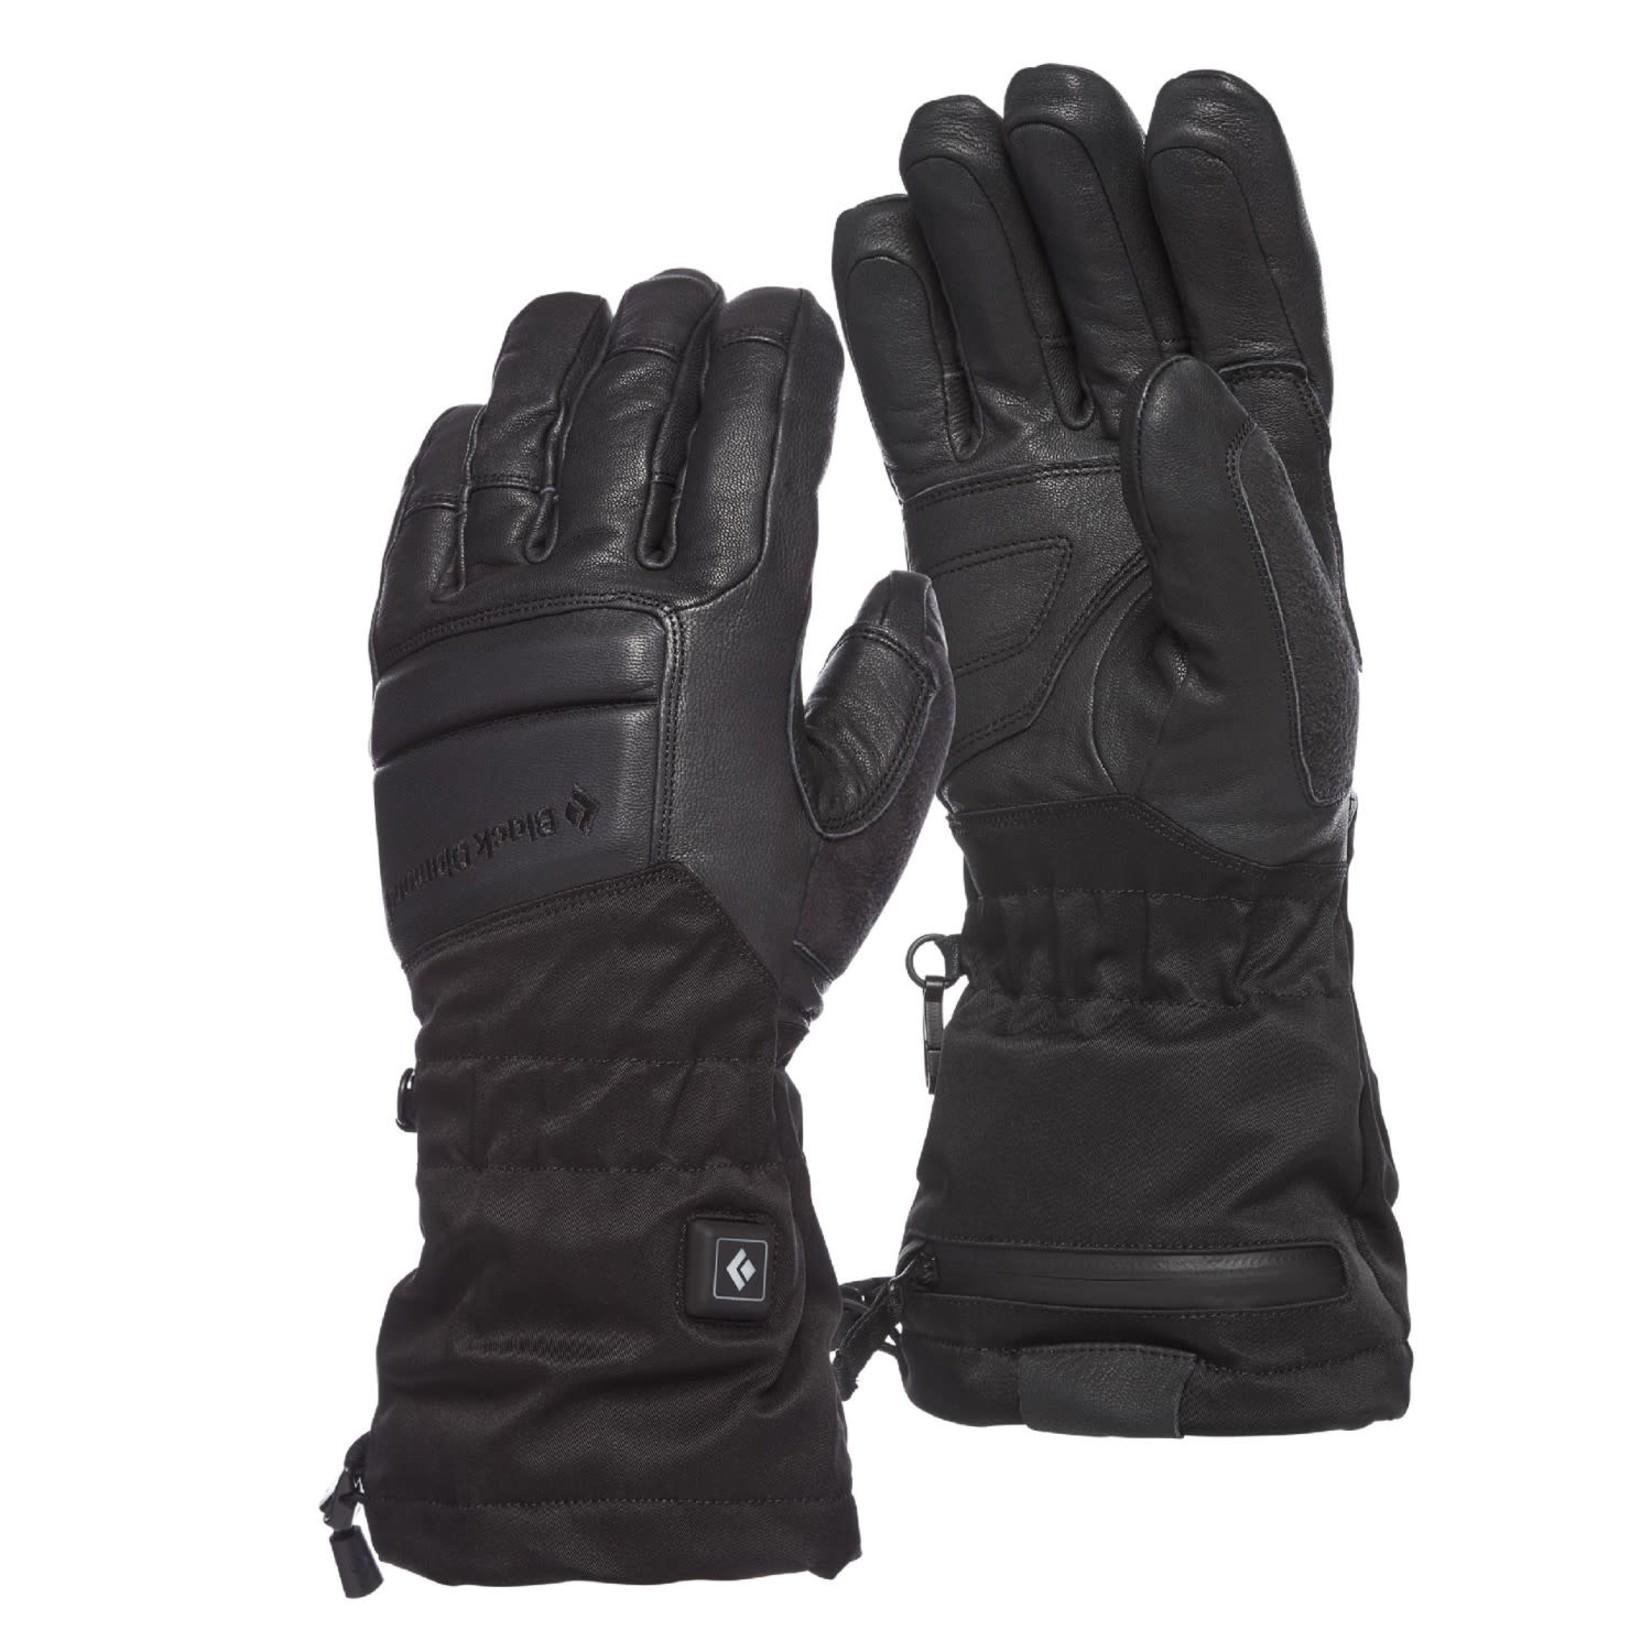 Black Diamond Black Diamond Solano Gloves Heated - Unisex